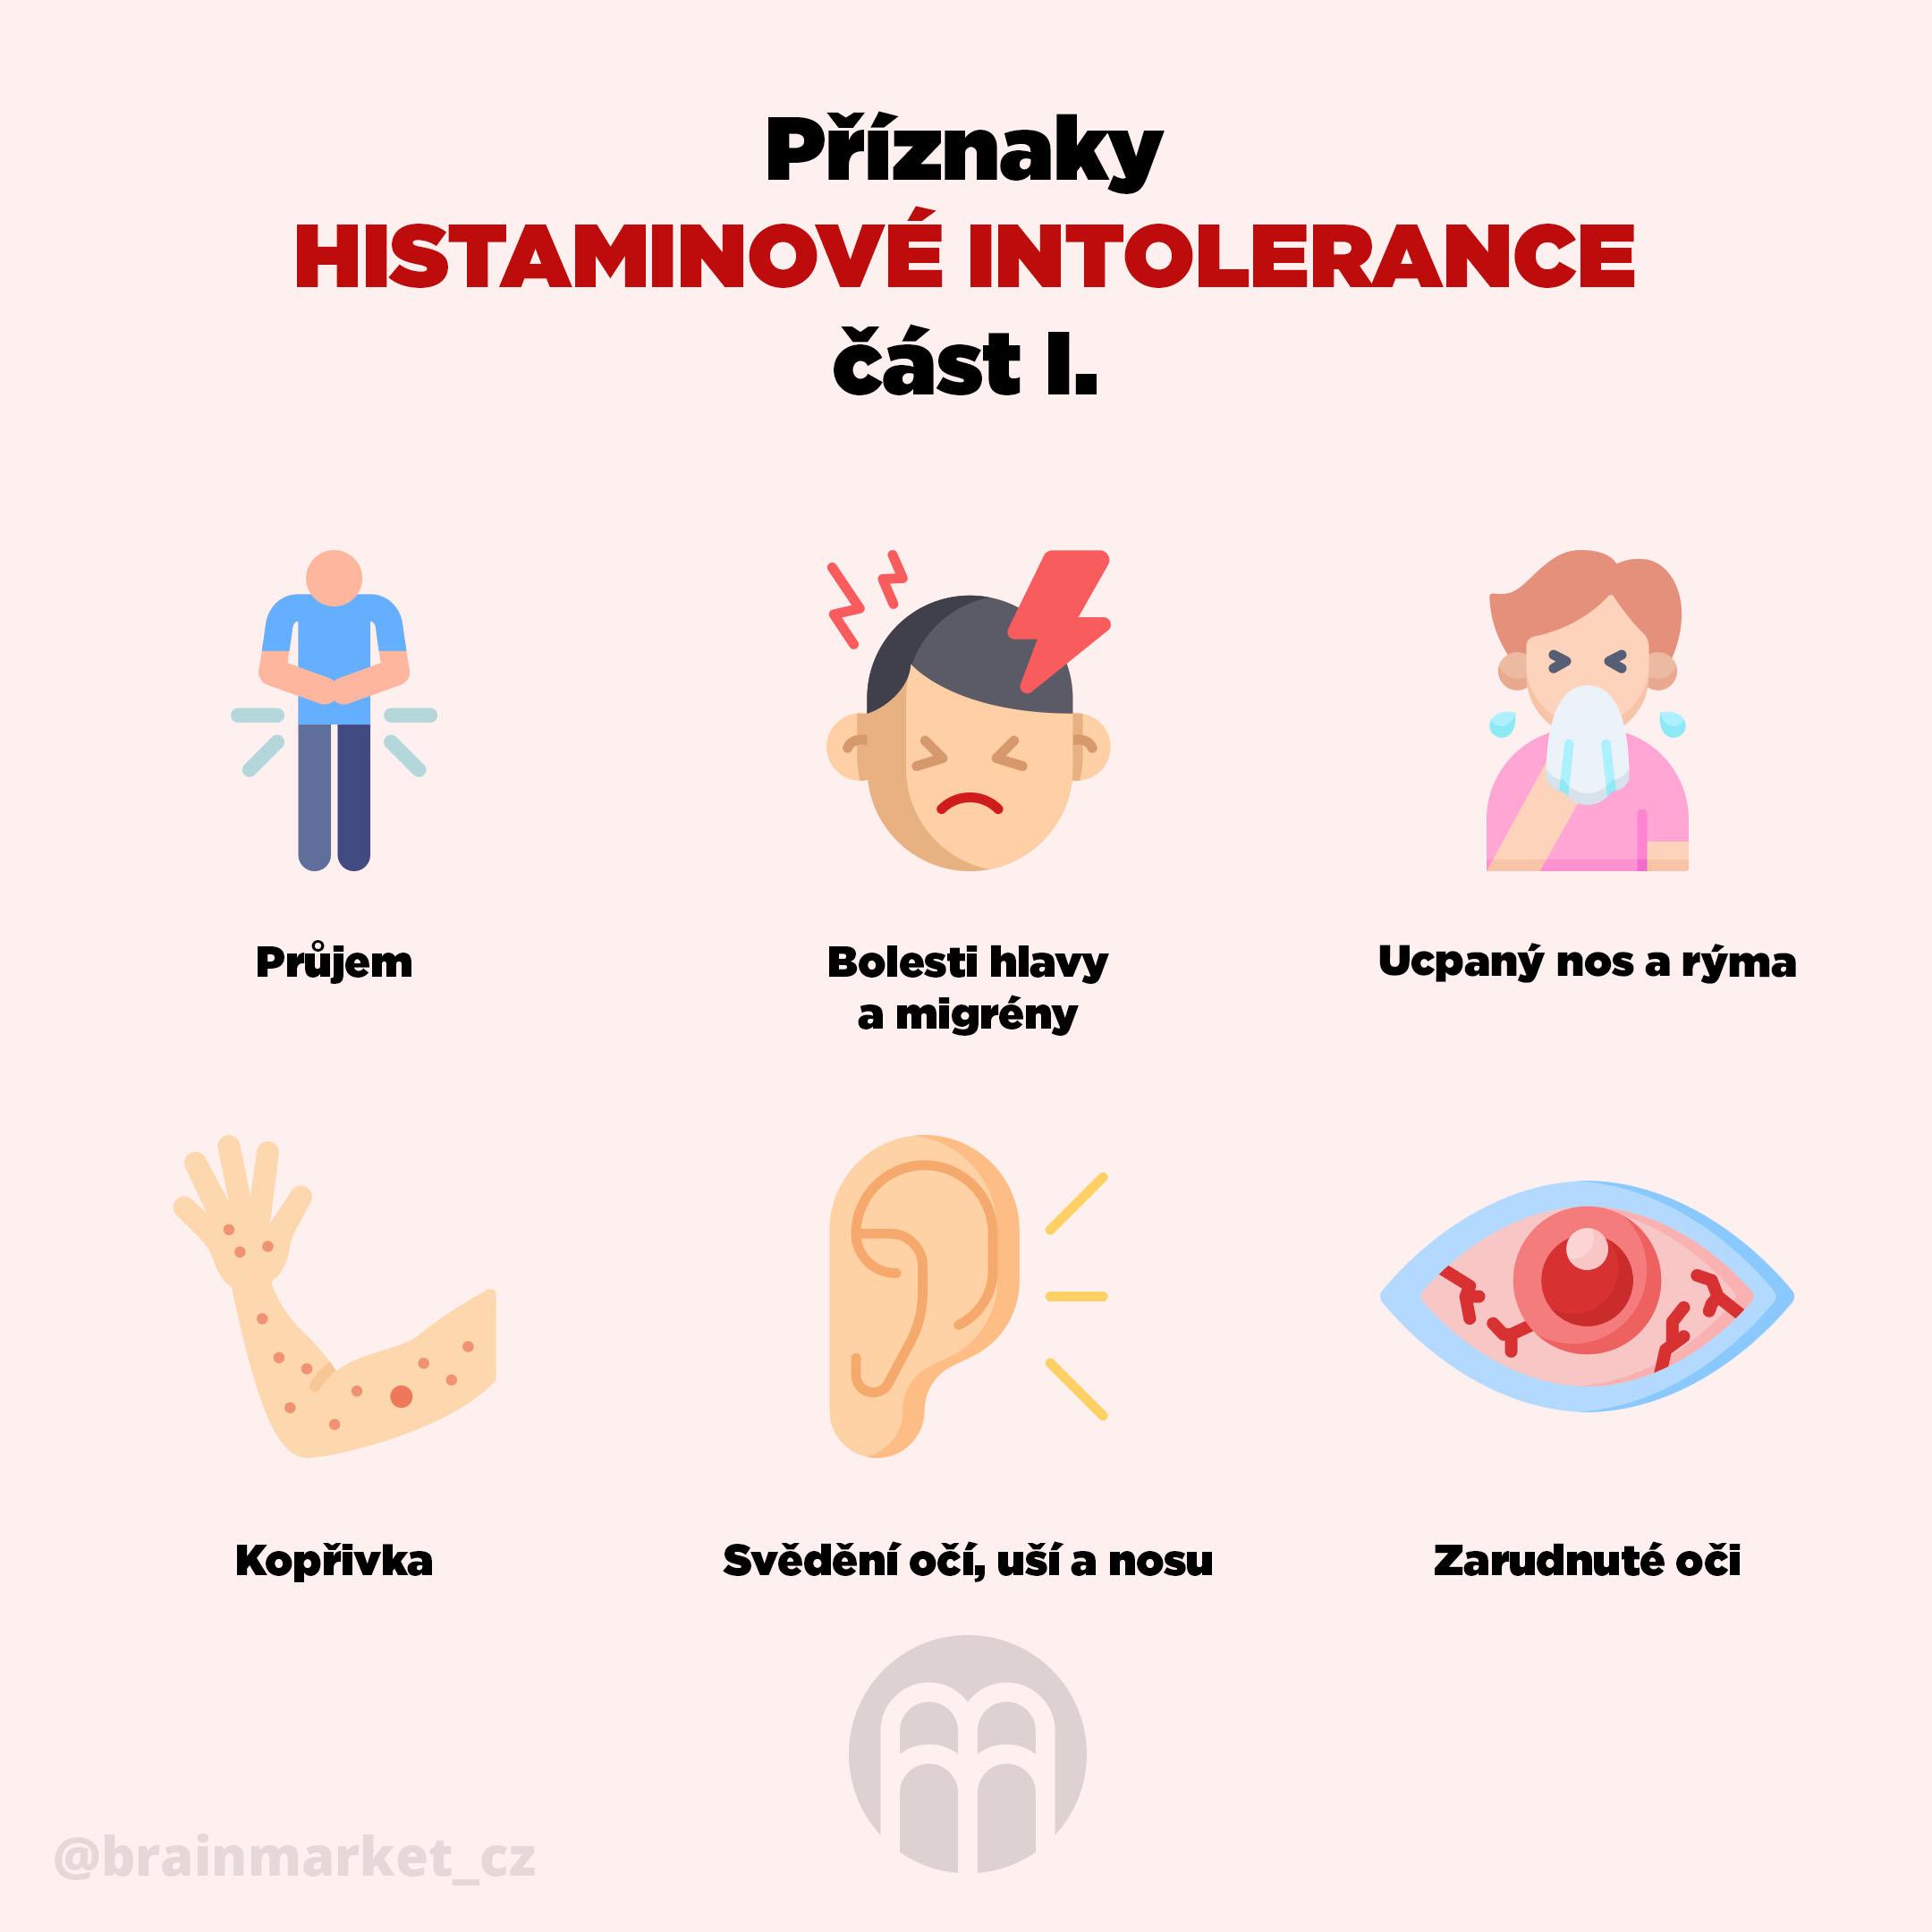 priznaky_histaminove_intolerance_cast_1_Infografika-BrainMarket_CZ